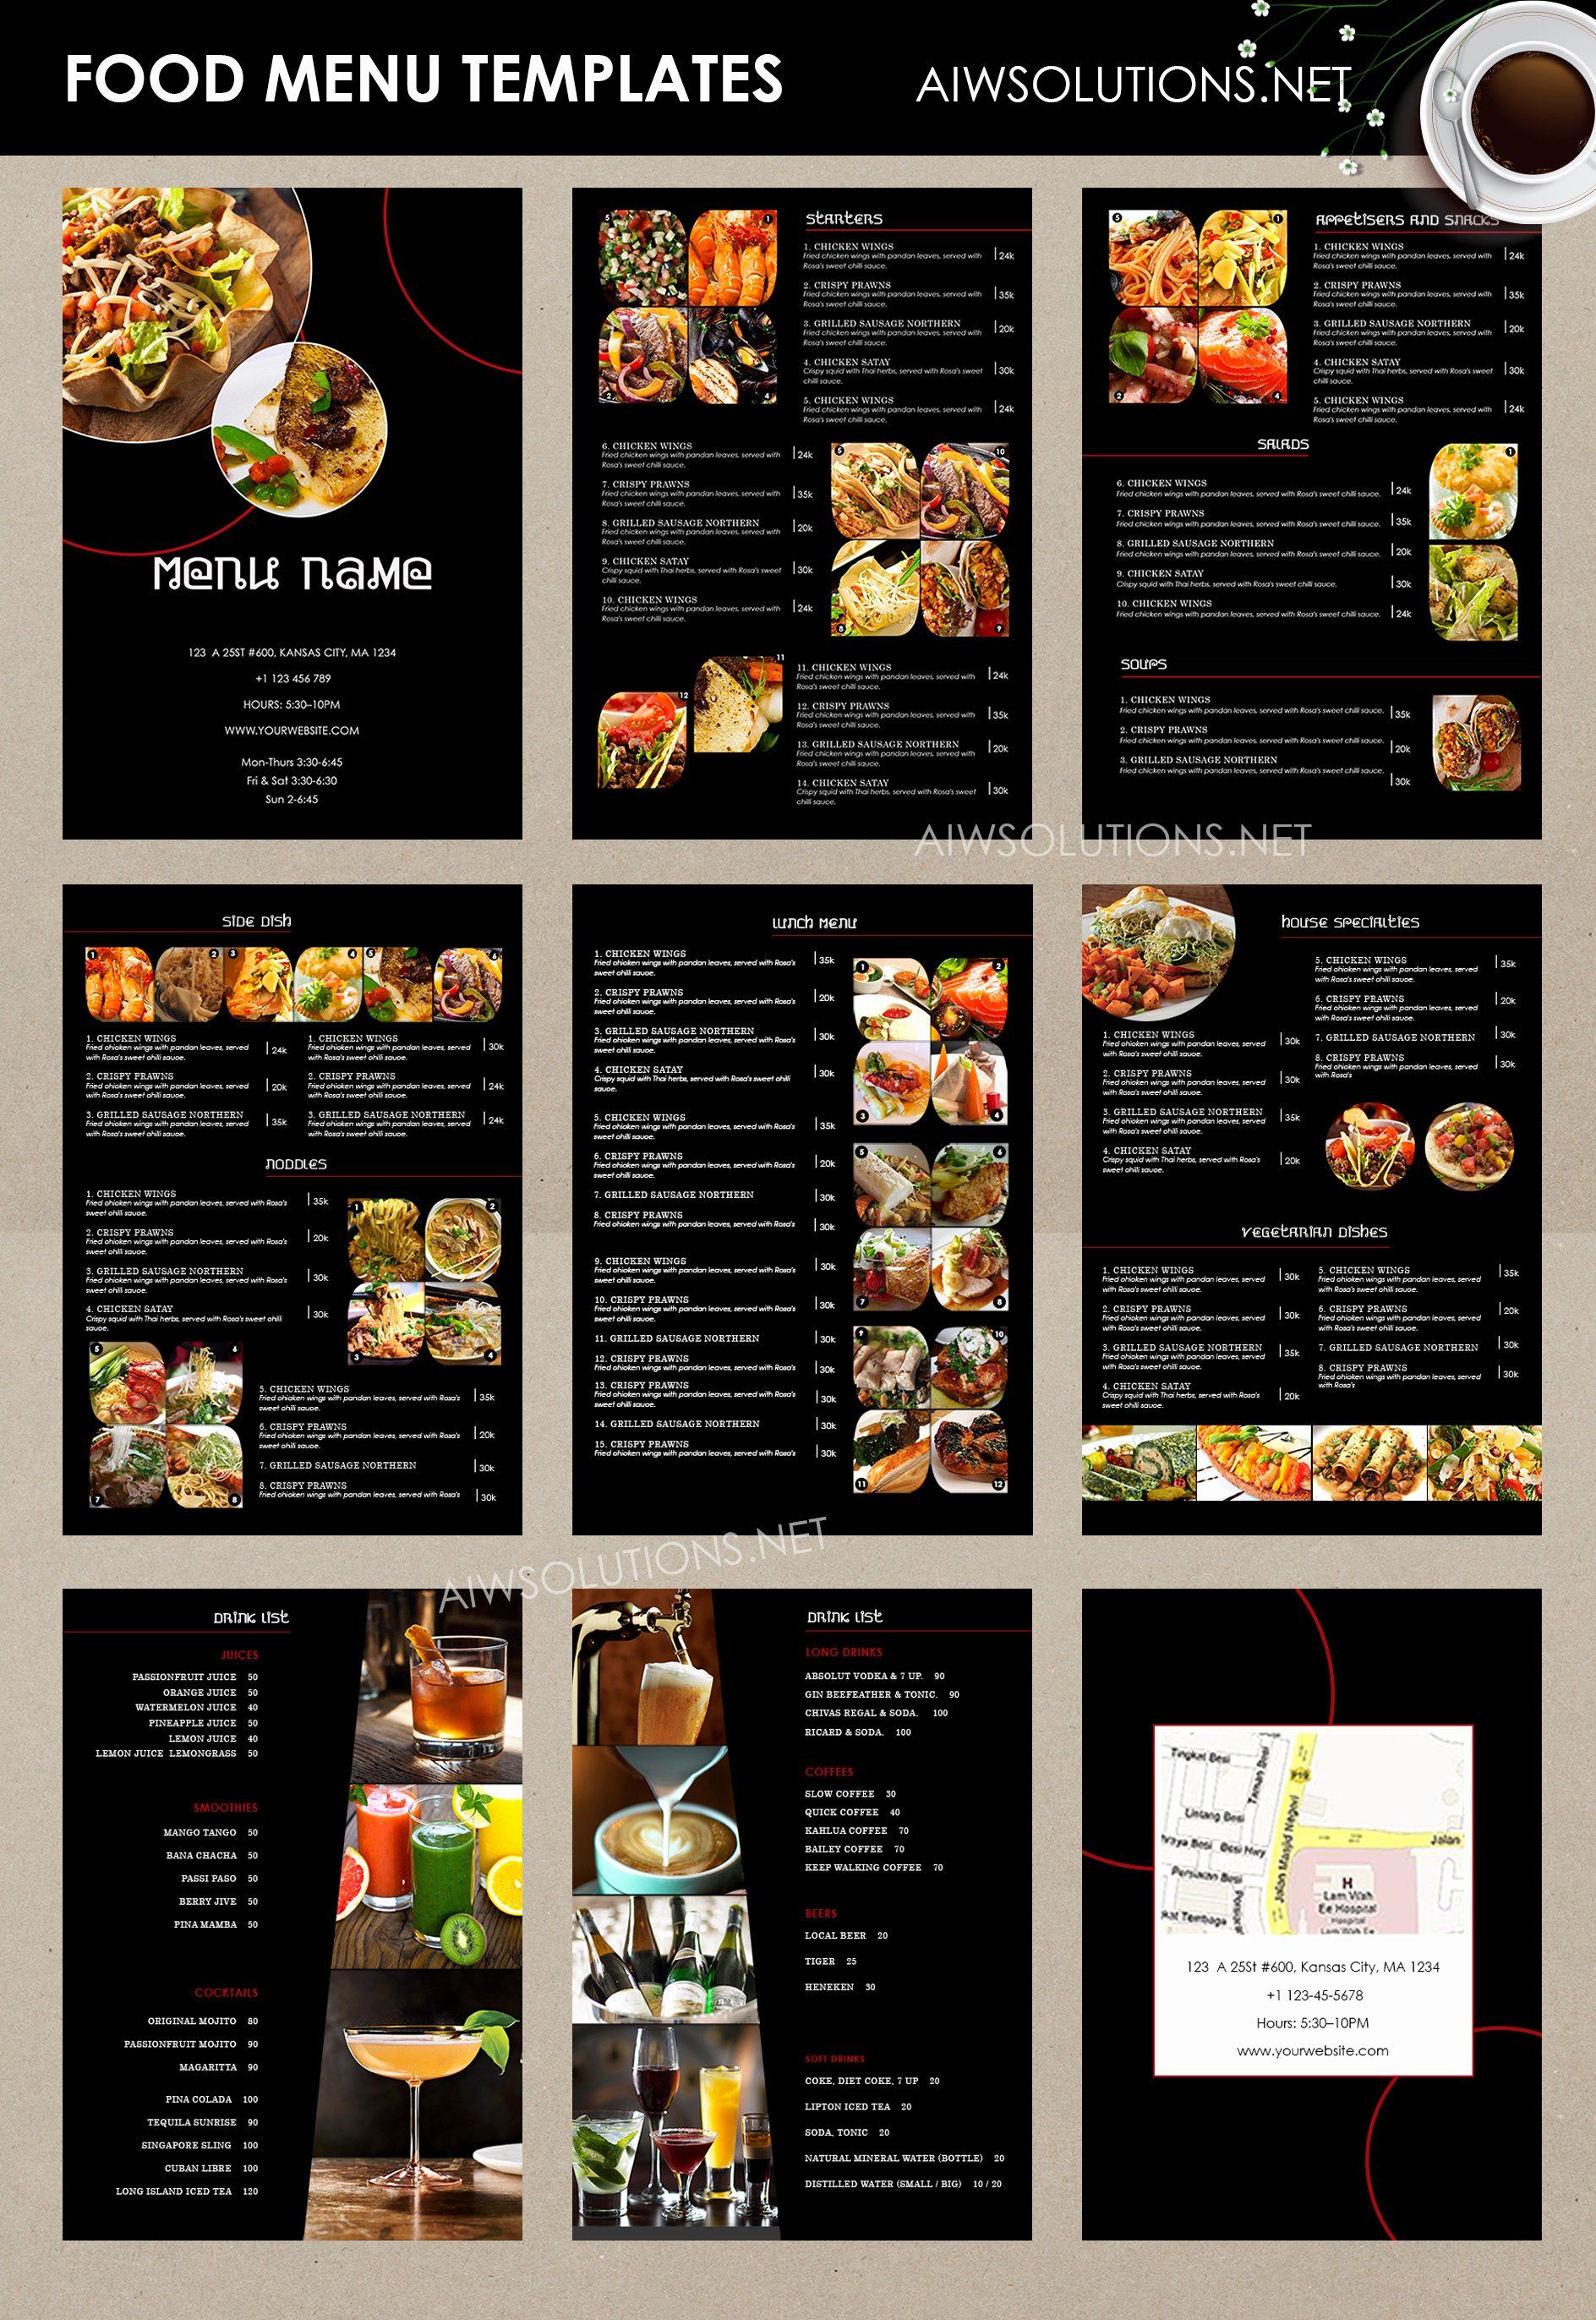 Bar Menu Template Free New Design & Templates Menu Templates Wedding Menu Food